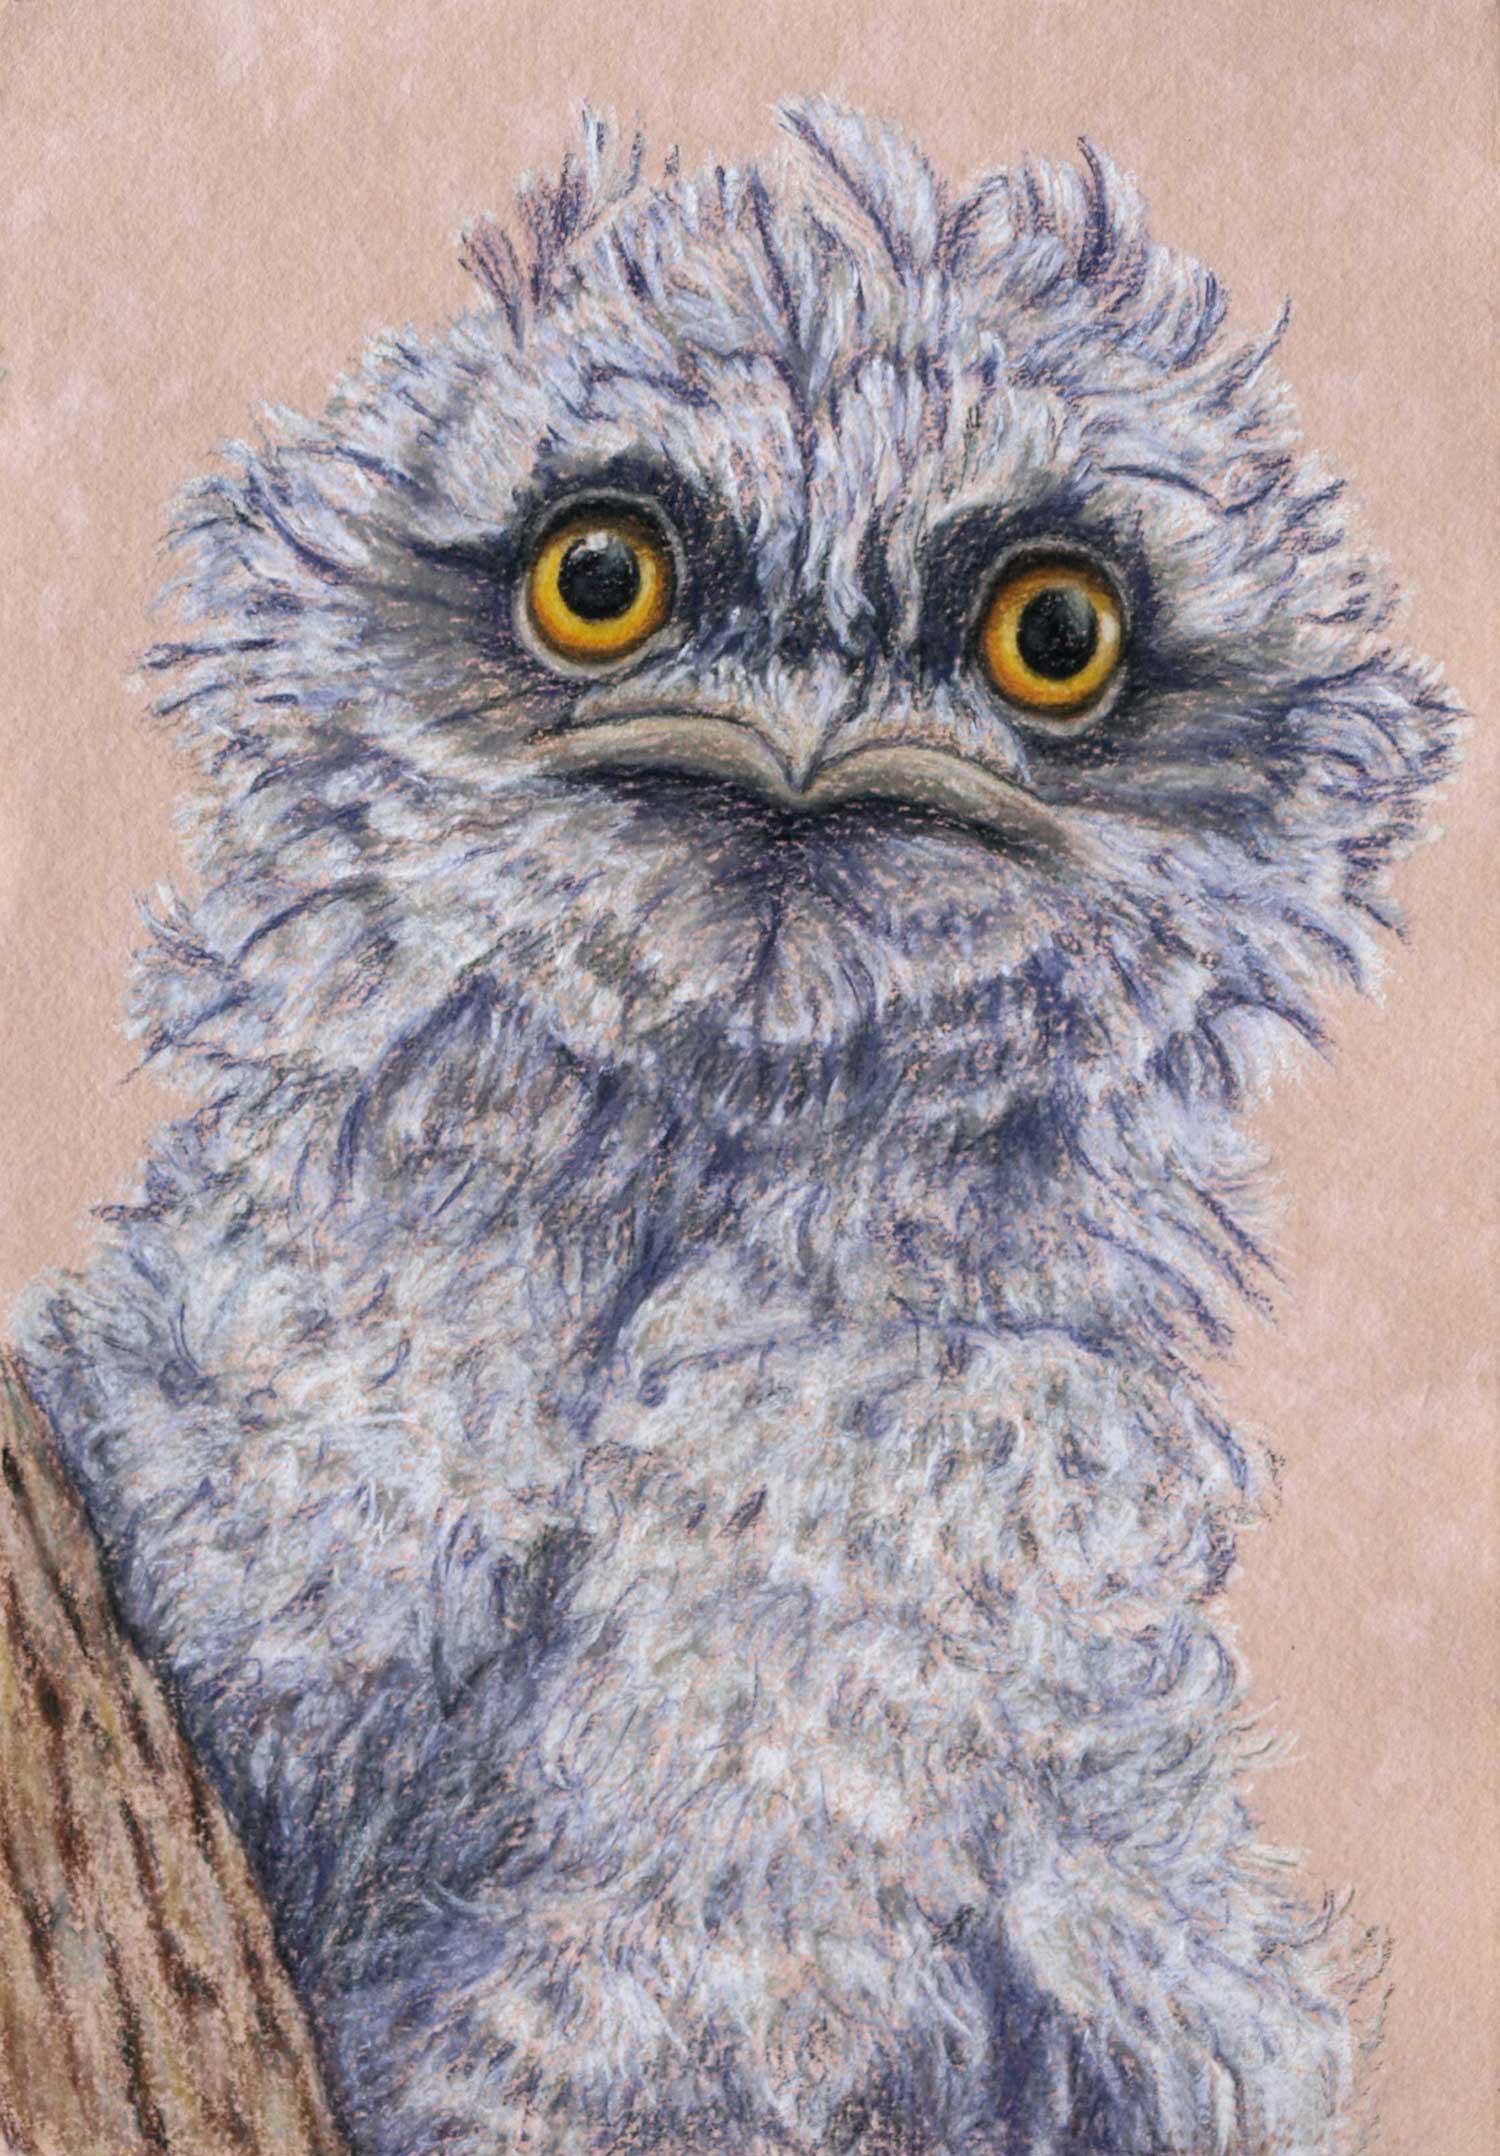 tawny-fogmouth-chick-drawing-rachel-newling.jpg